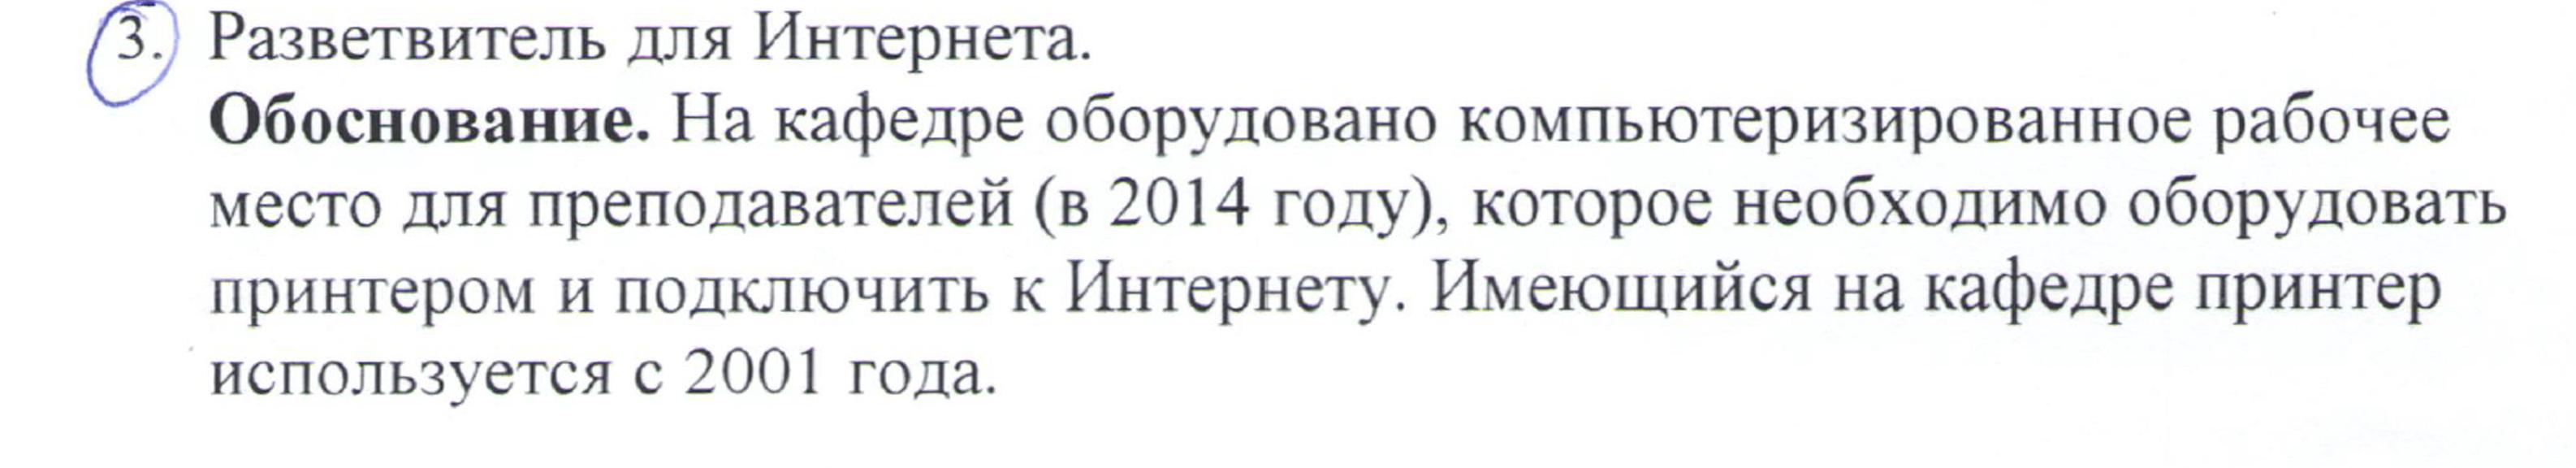 http://sa.uploads.ru/19hgv.jpg